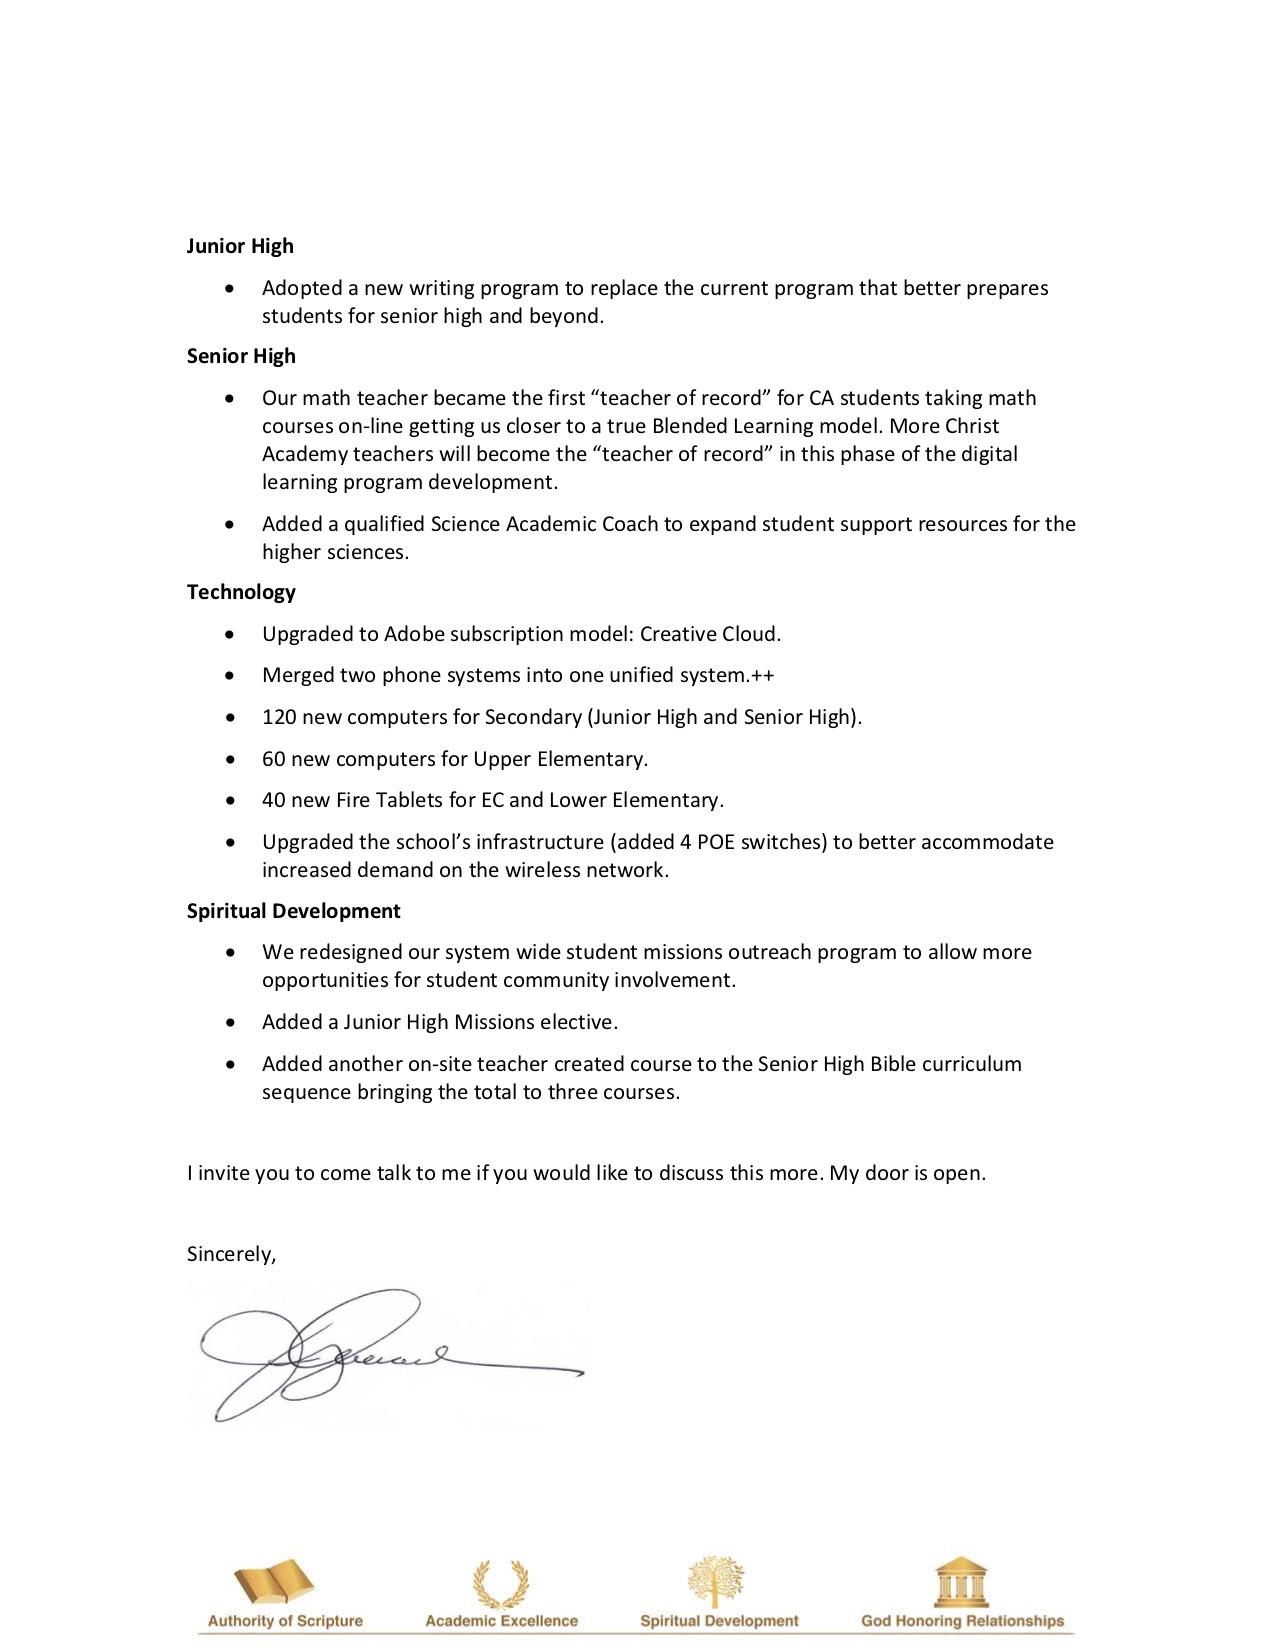 Dr. Meadows 2018-2019 Letter Page 2 copy.jpg